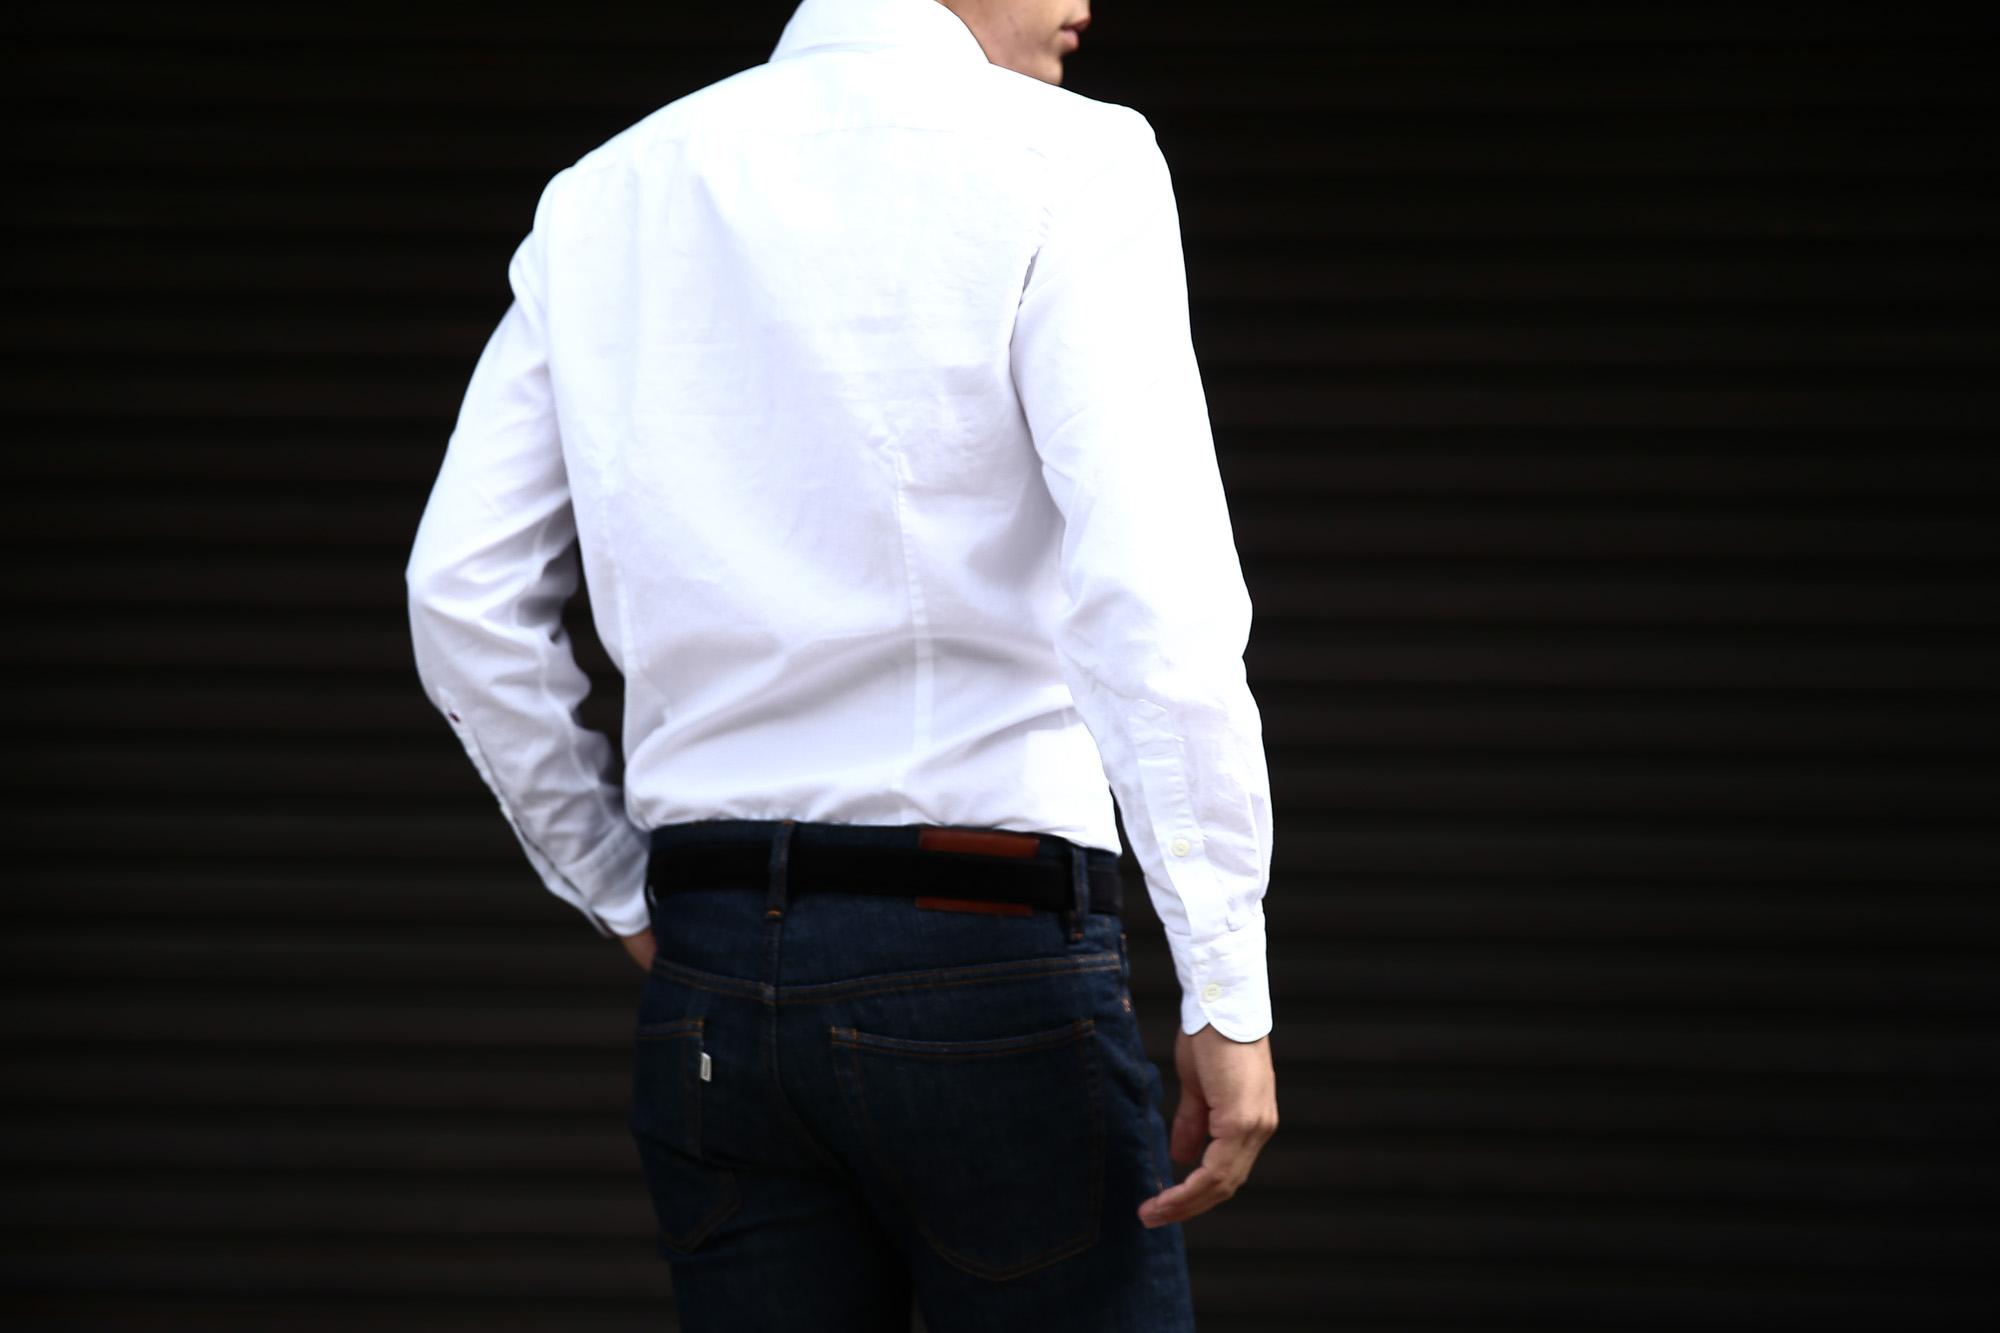 Glanshirt (グランシャツ) JWEEN G6971 OXFORD COTTON 100% カッタウェイシャツ オックスフォードシャツ WHITE (ホワイト・001) MADE IN ITALY(イタリア製) 2016 秋冬新作愛知 名古屋Alto e Diritto アルト エ デリット シャツ 白シャツ 36,37,38,39,40,41